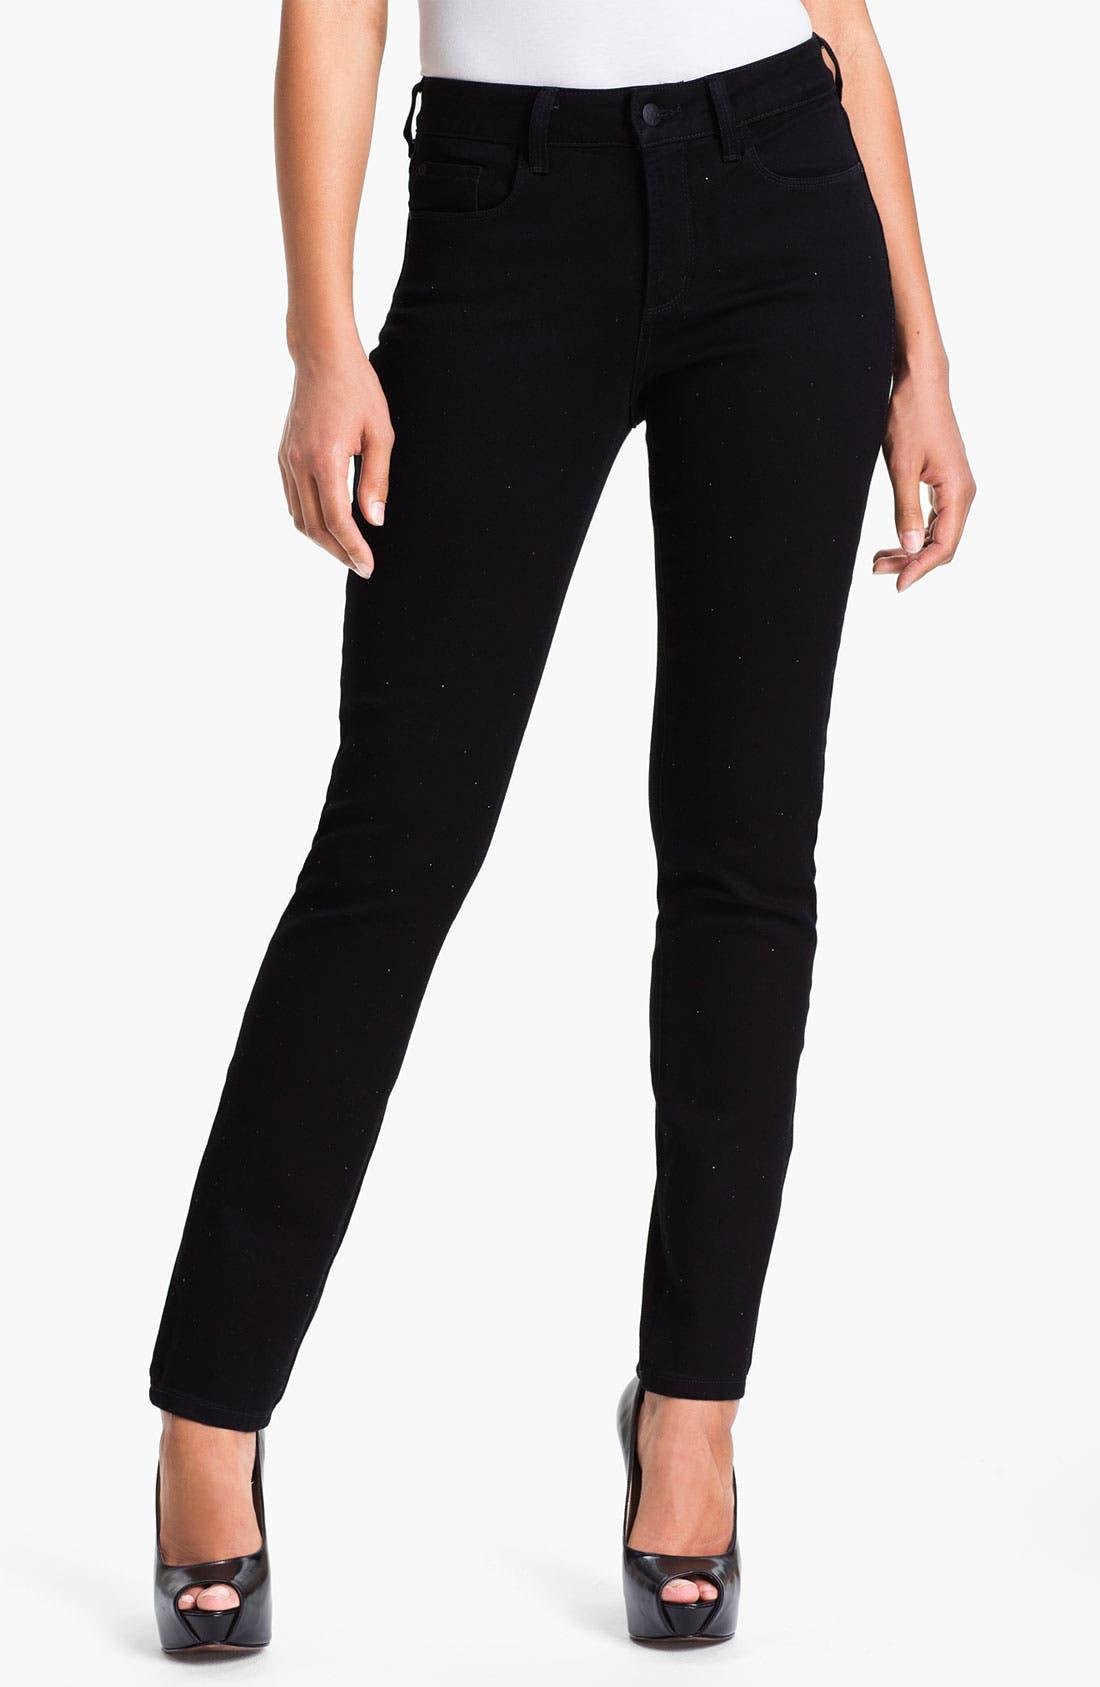 Alternate Image 1 Selected - NYDJ 'Sheri' Sparkle Skinny Stretch Jeans